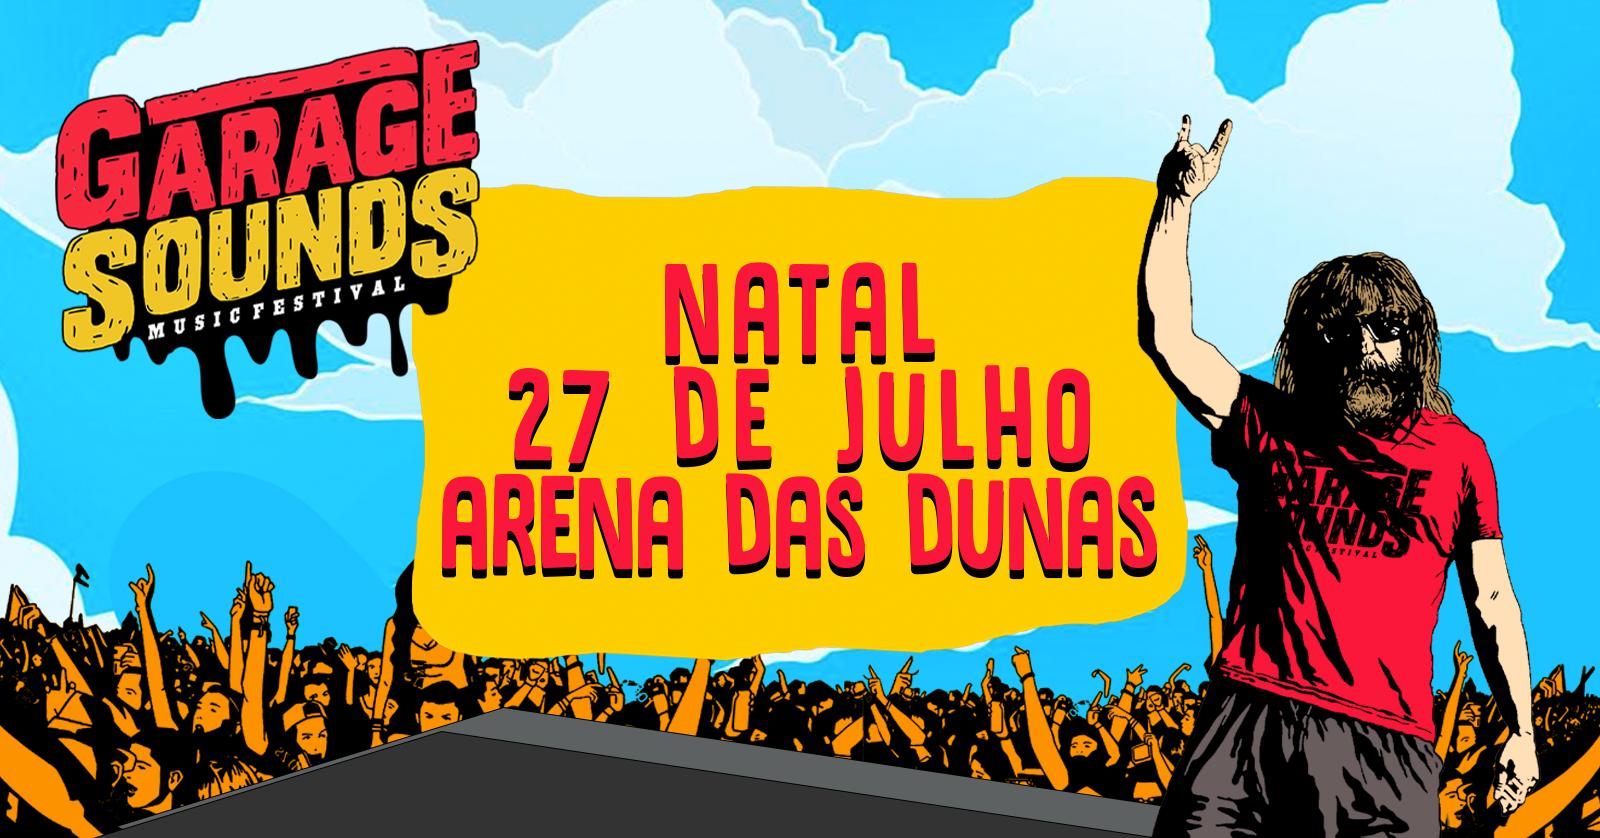 Festival Garage Sounds desembarca na Arena das Dunas